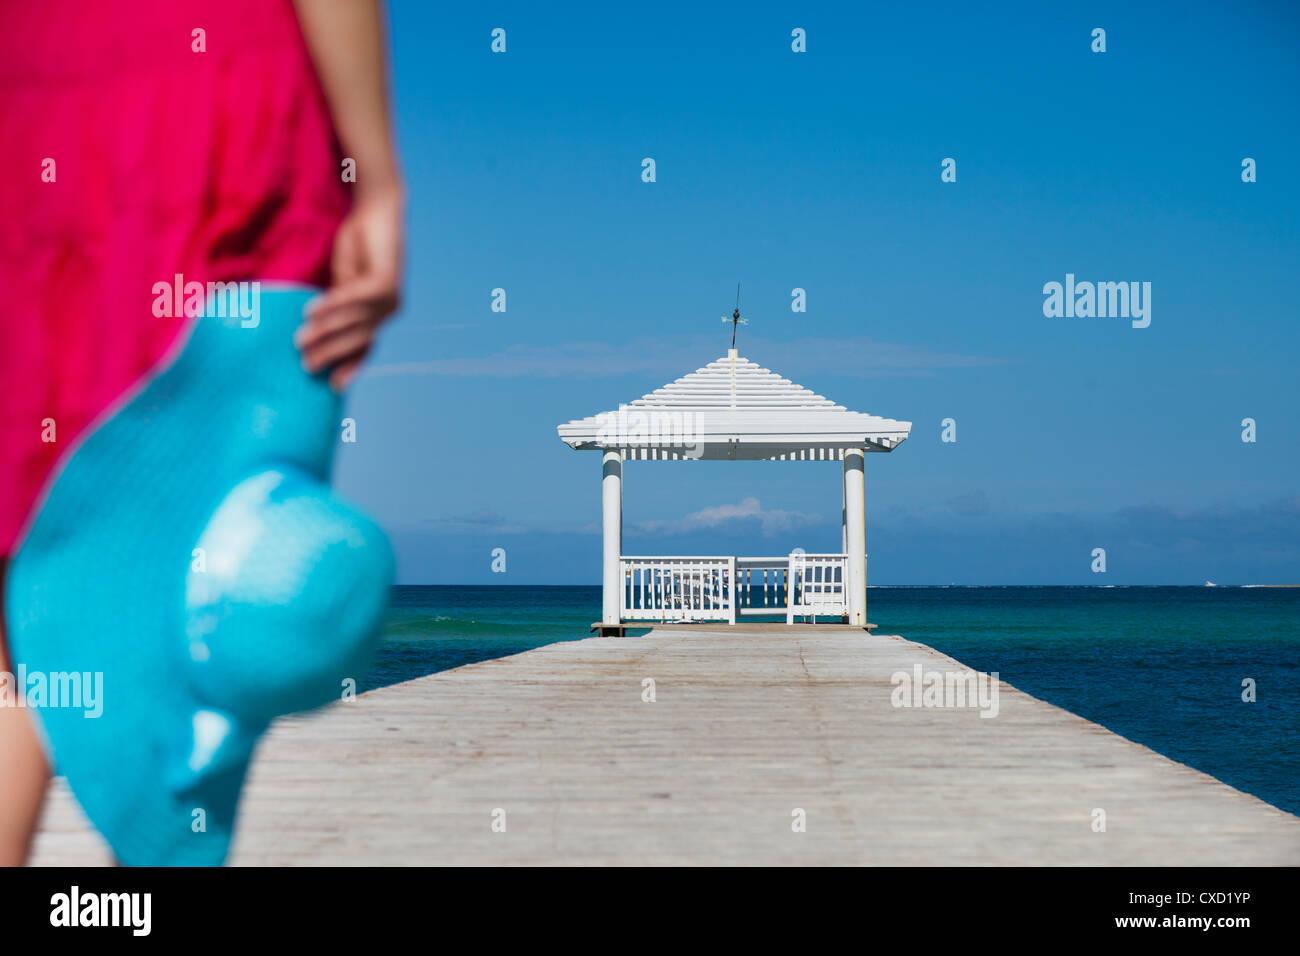 Bahamas, West Indies, dei Caraibi e America centrale Immagini Stock